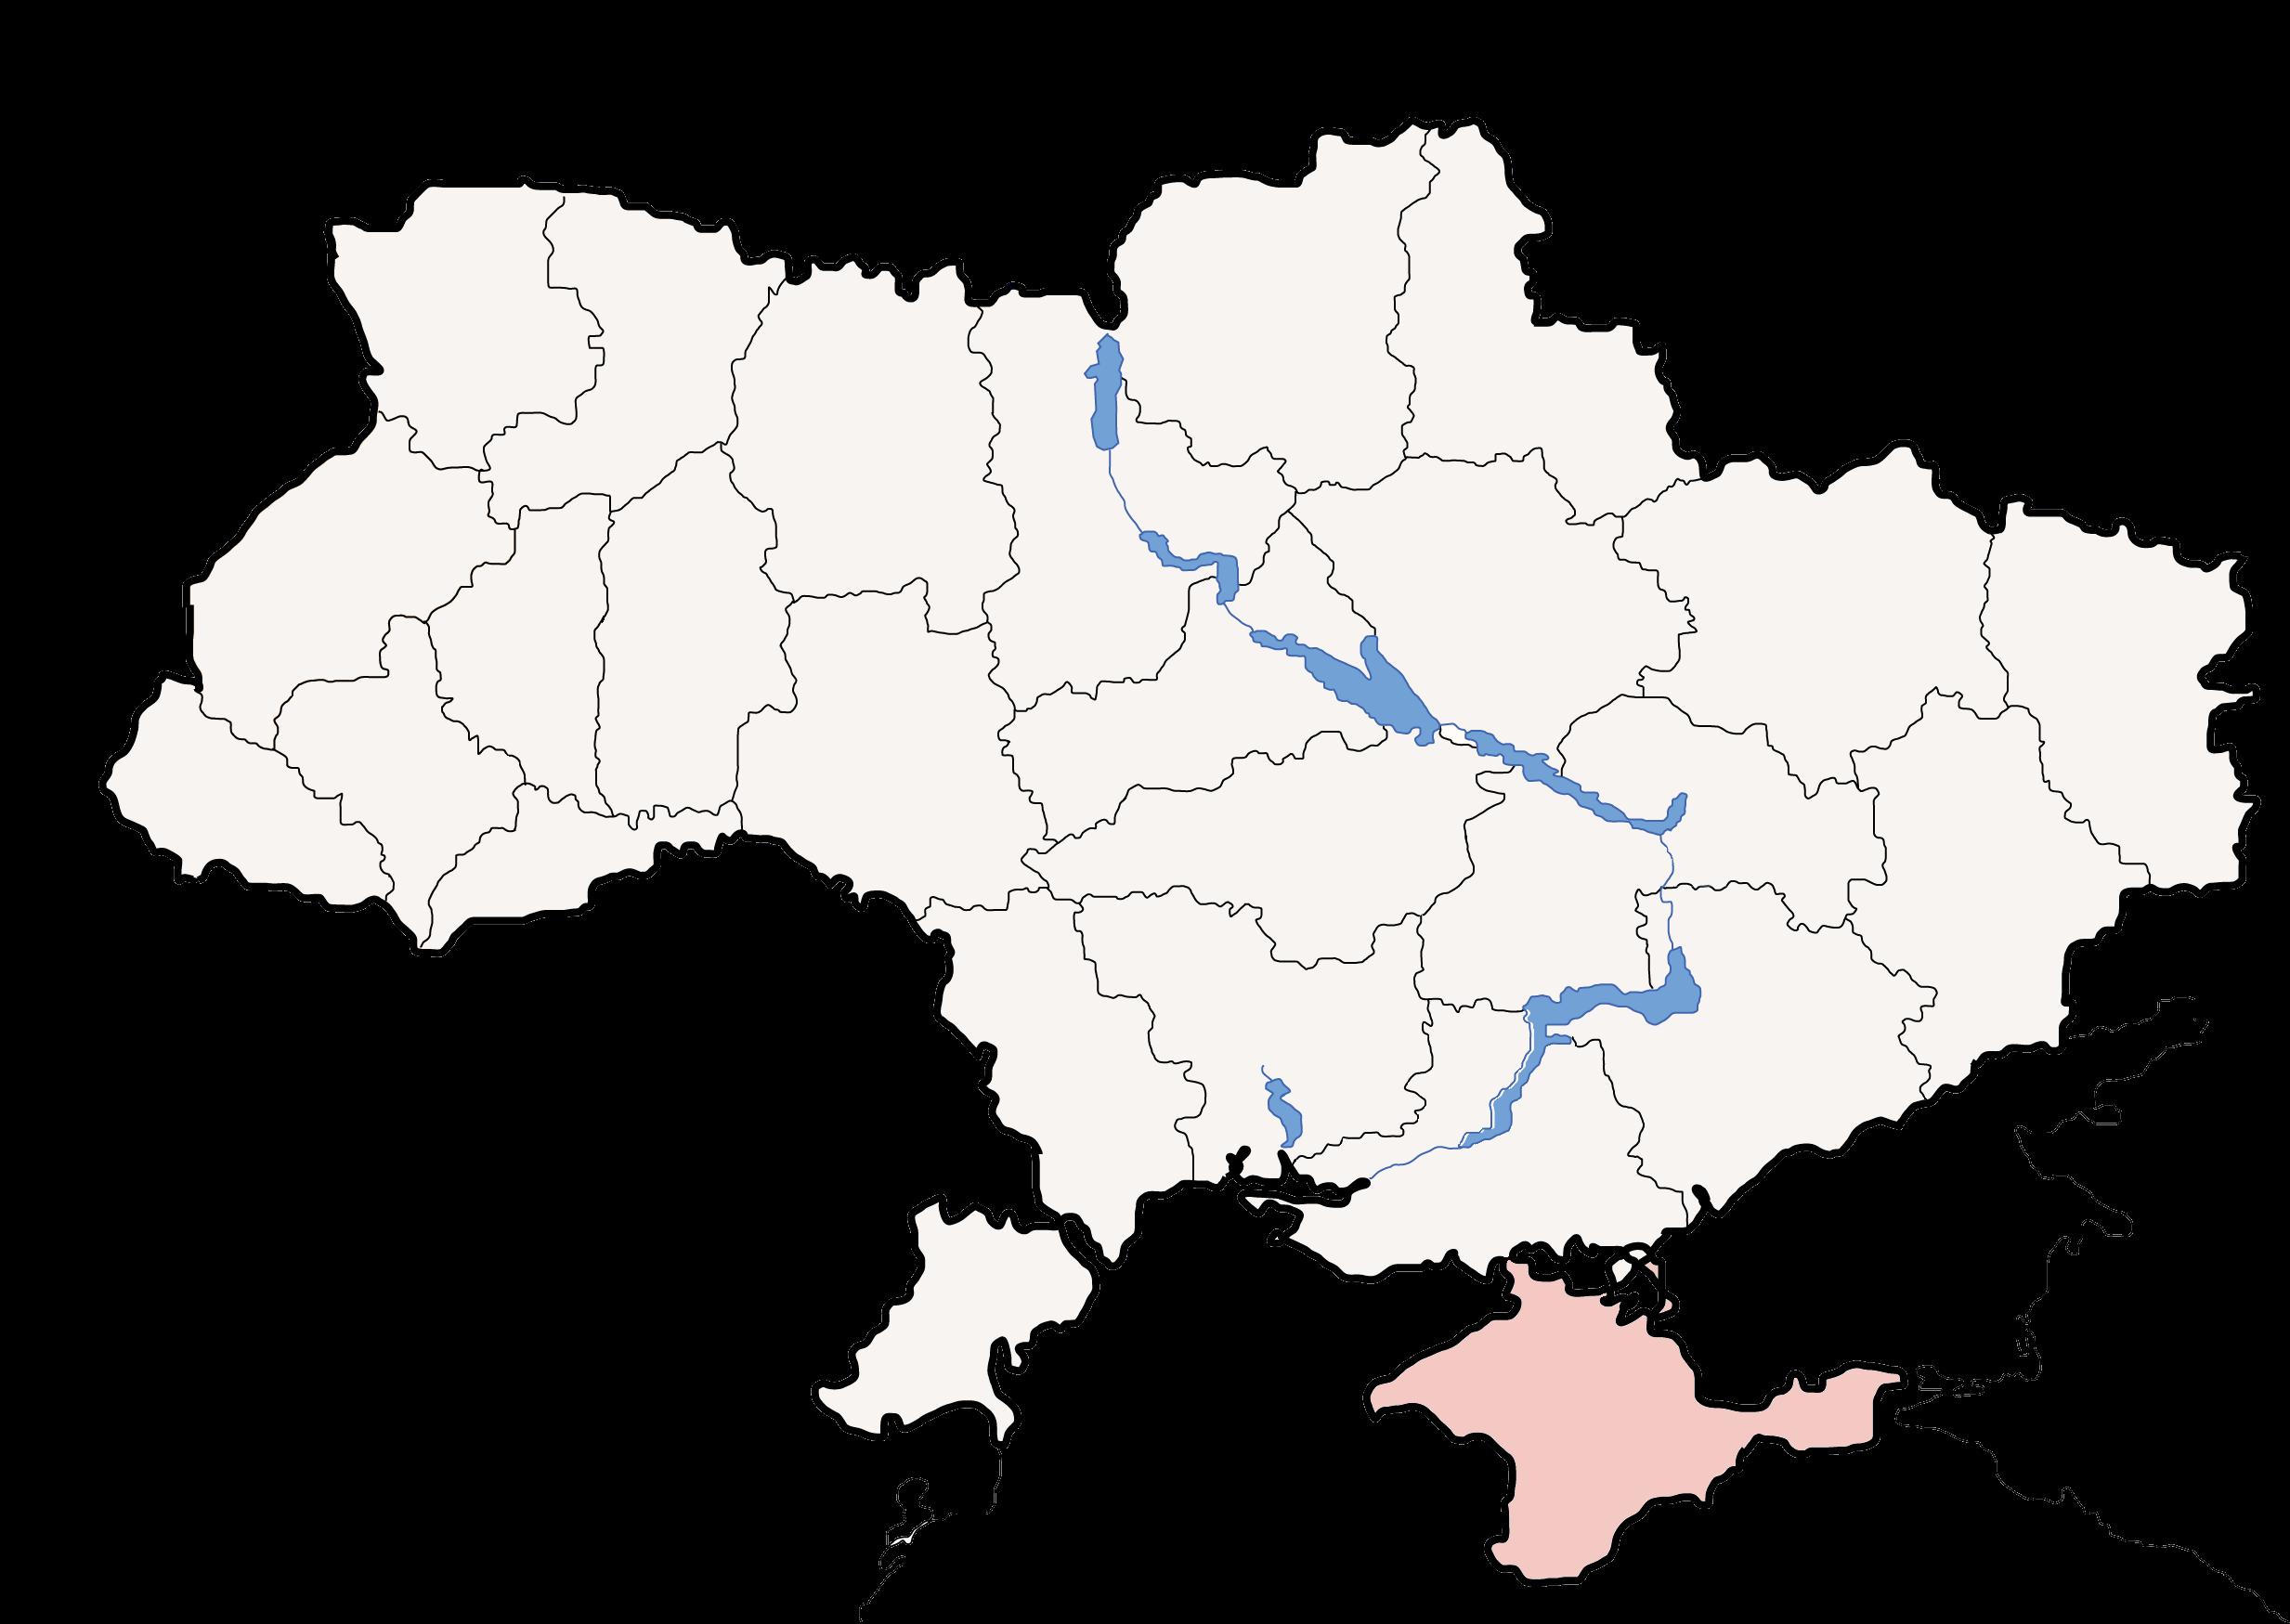 FileMap Of Ukraine Political Simple Oblast Krimpng Wikimedia - Ukraine political map